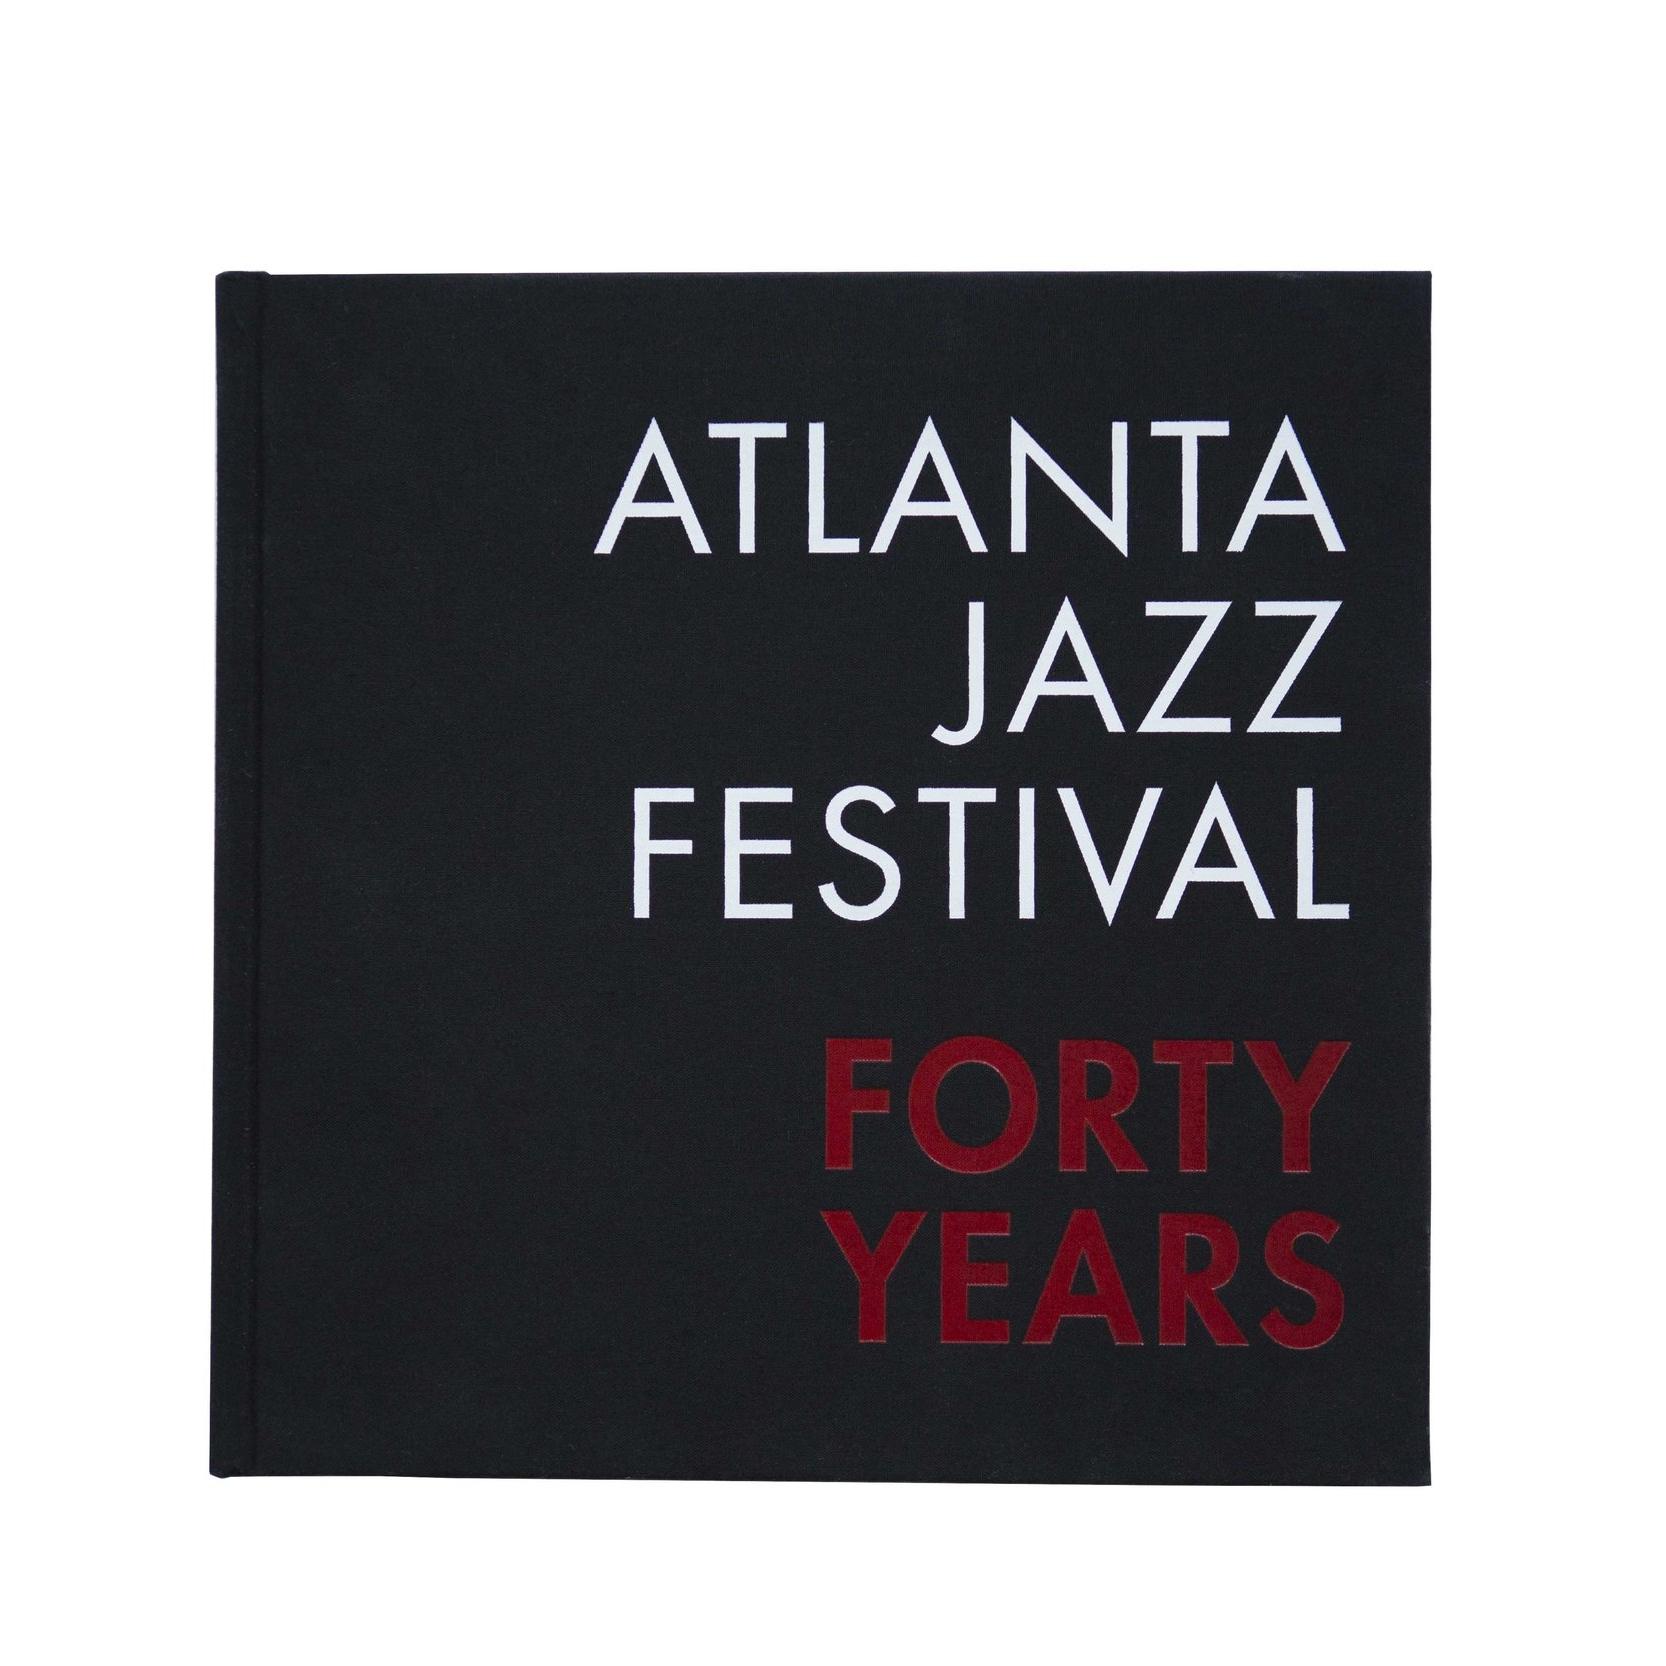 Atlanta Jazz Festival: Forty Years  City of Atlanta, Office of Cultural Affairs $65.00